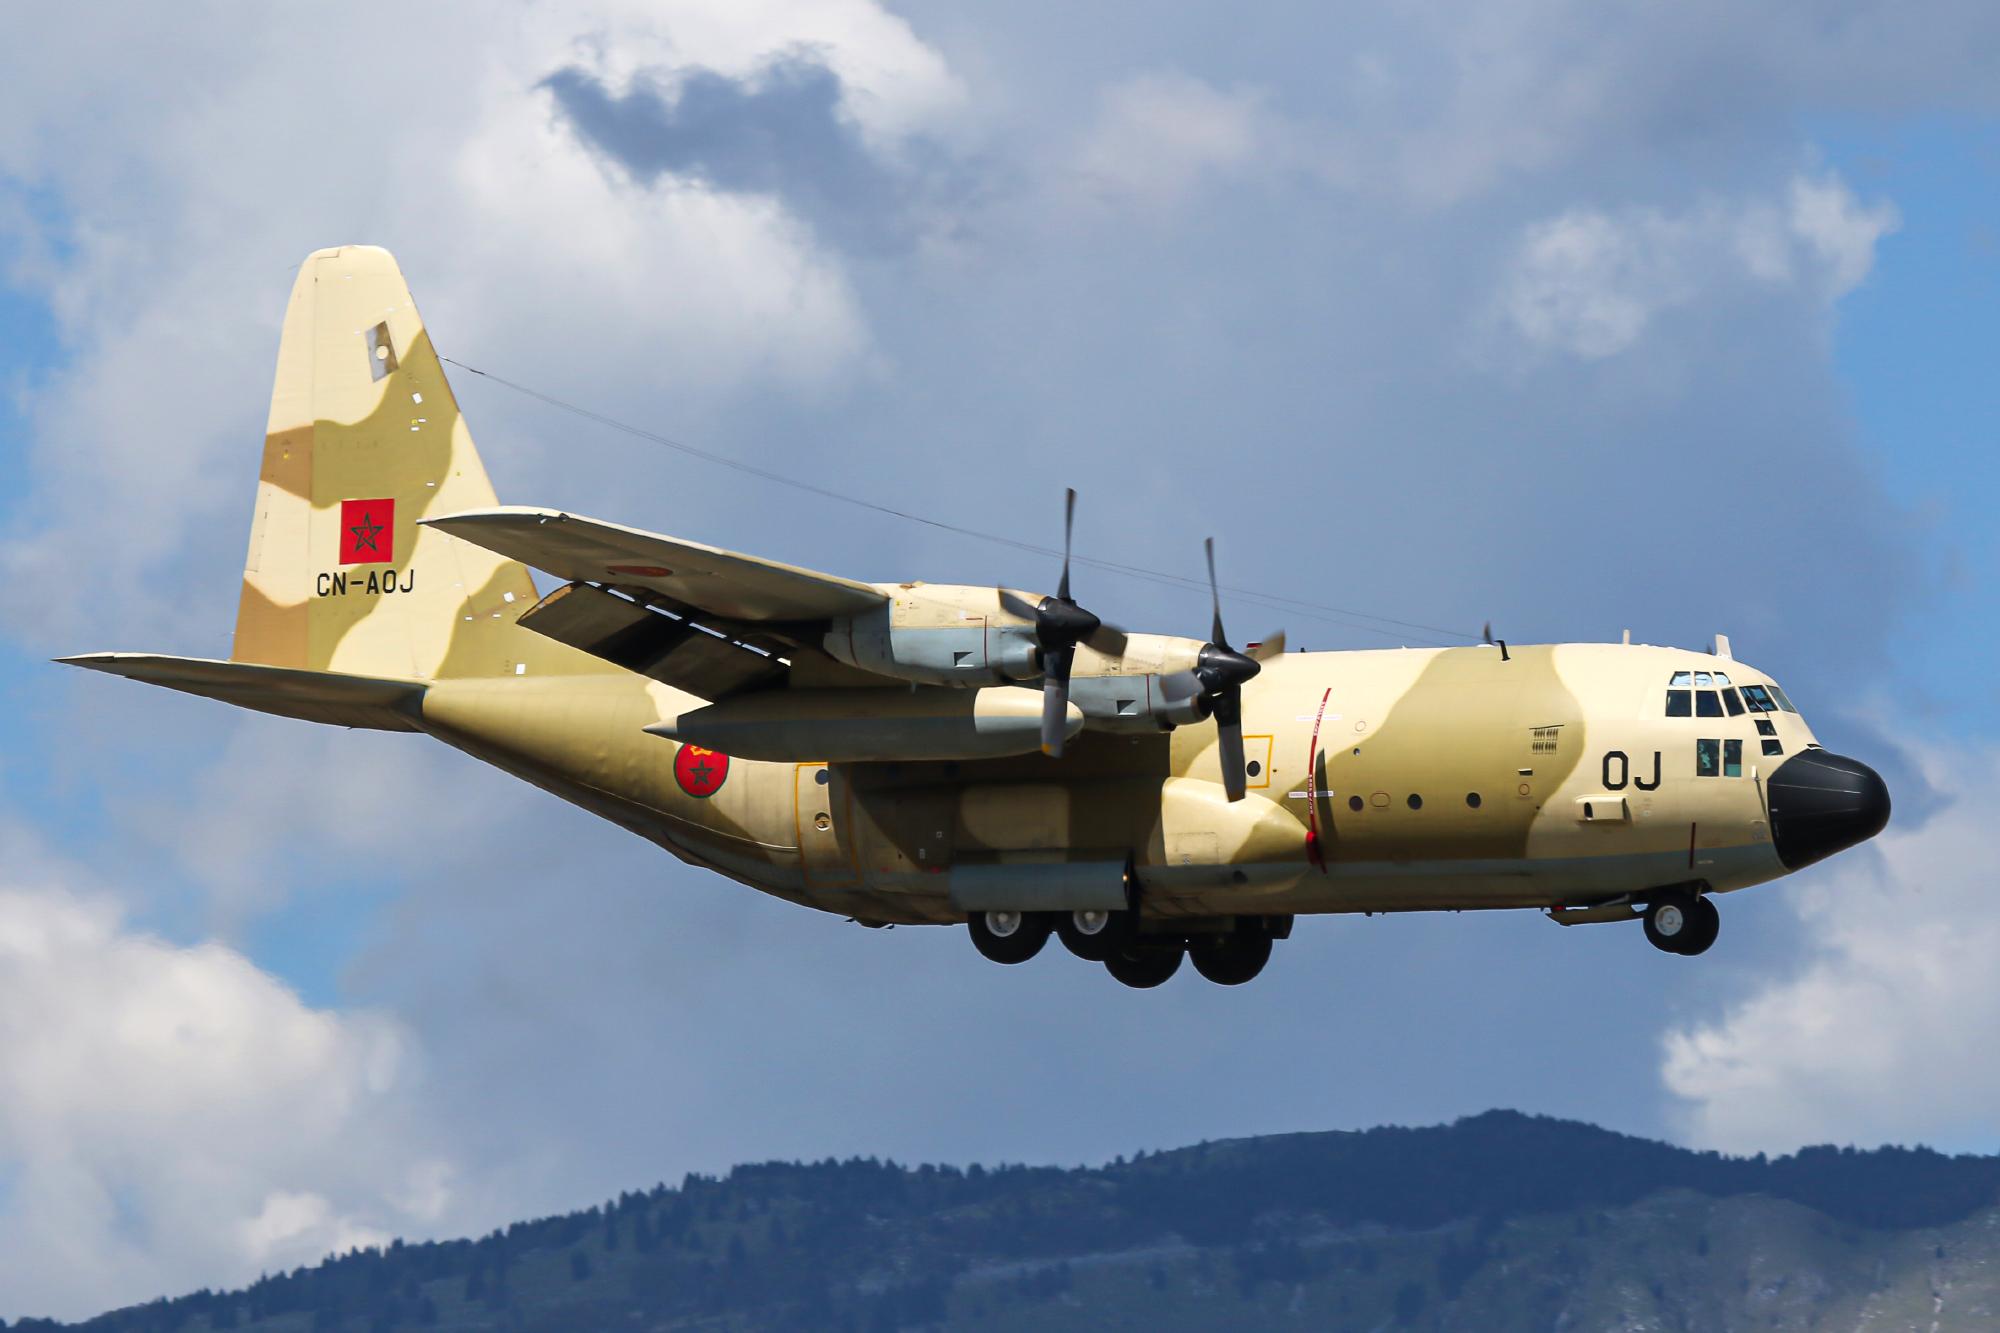 FRA: Photos d'avions de transport - Page 42 51193810301_a6ca51b49b_o_d